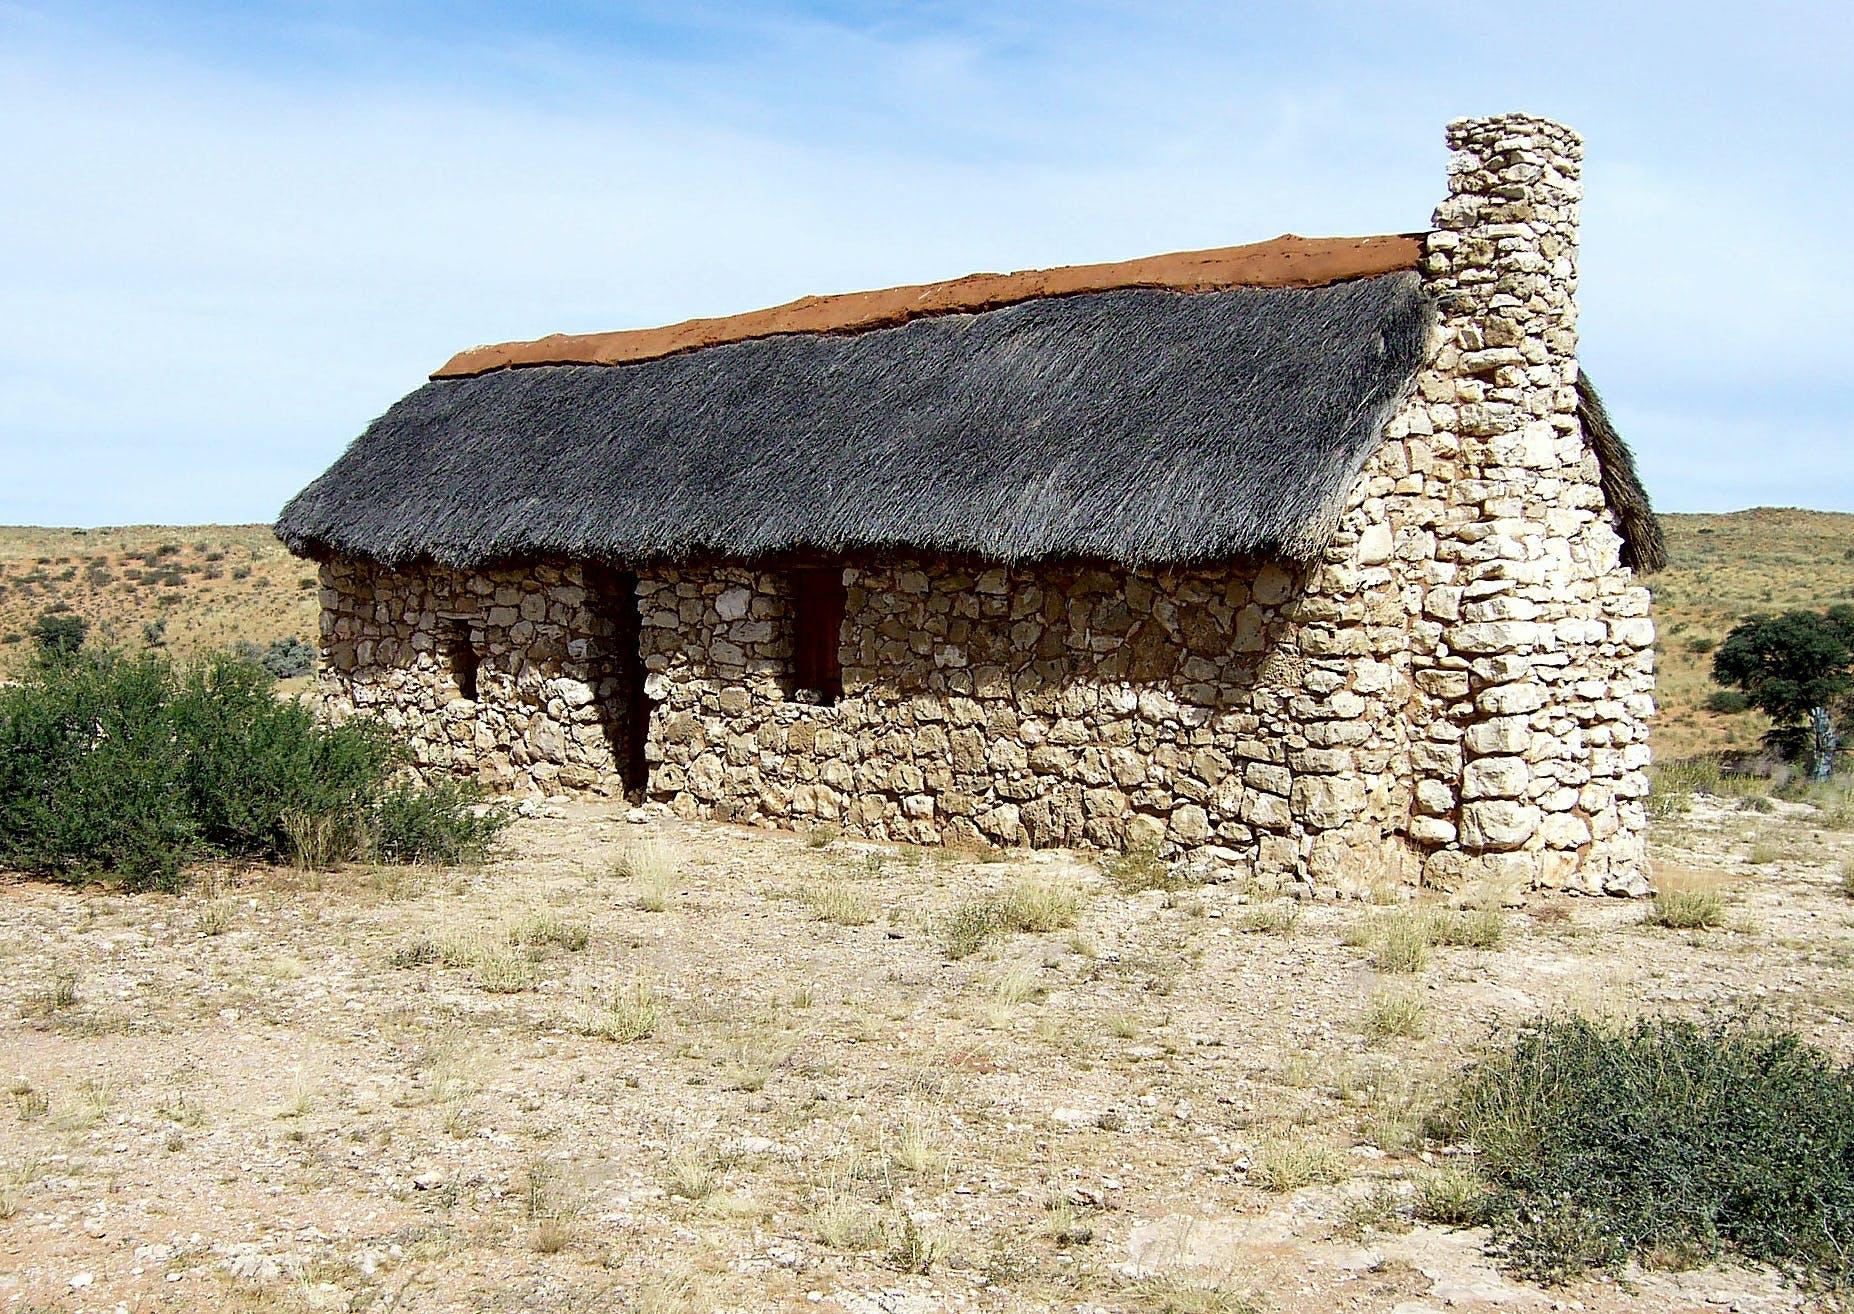 Free stock photo of farmer's cottage, historical, kalahari, stone dwelling